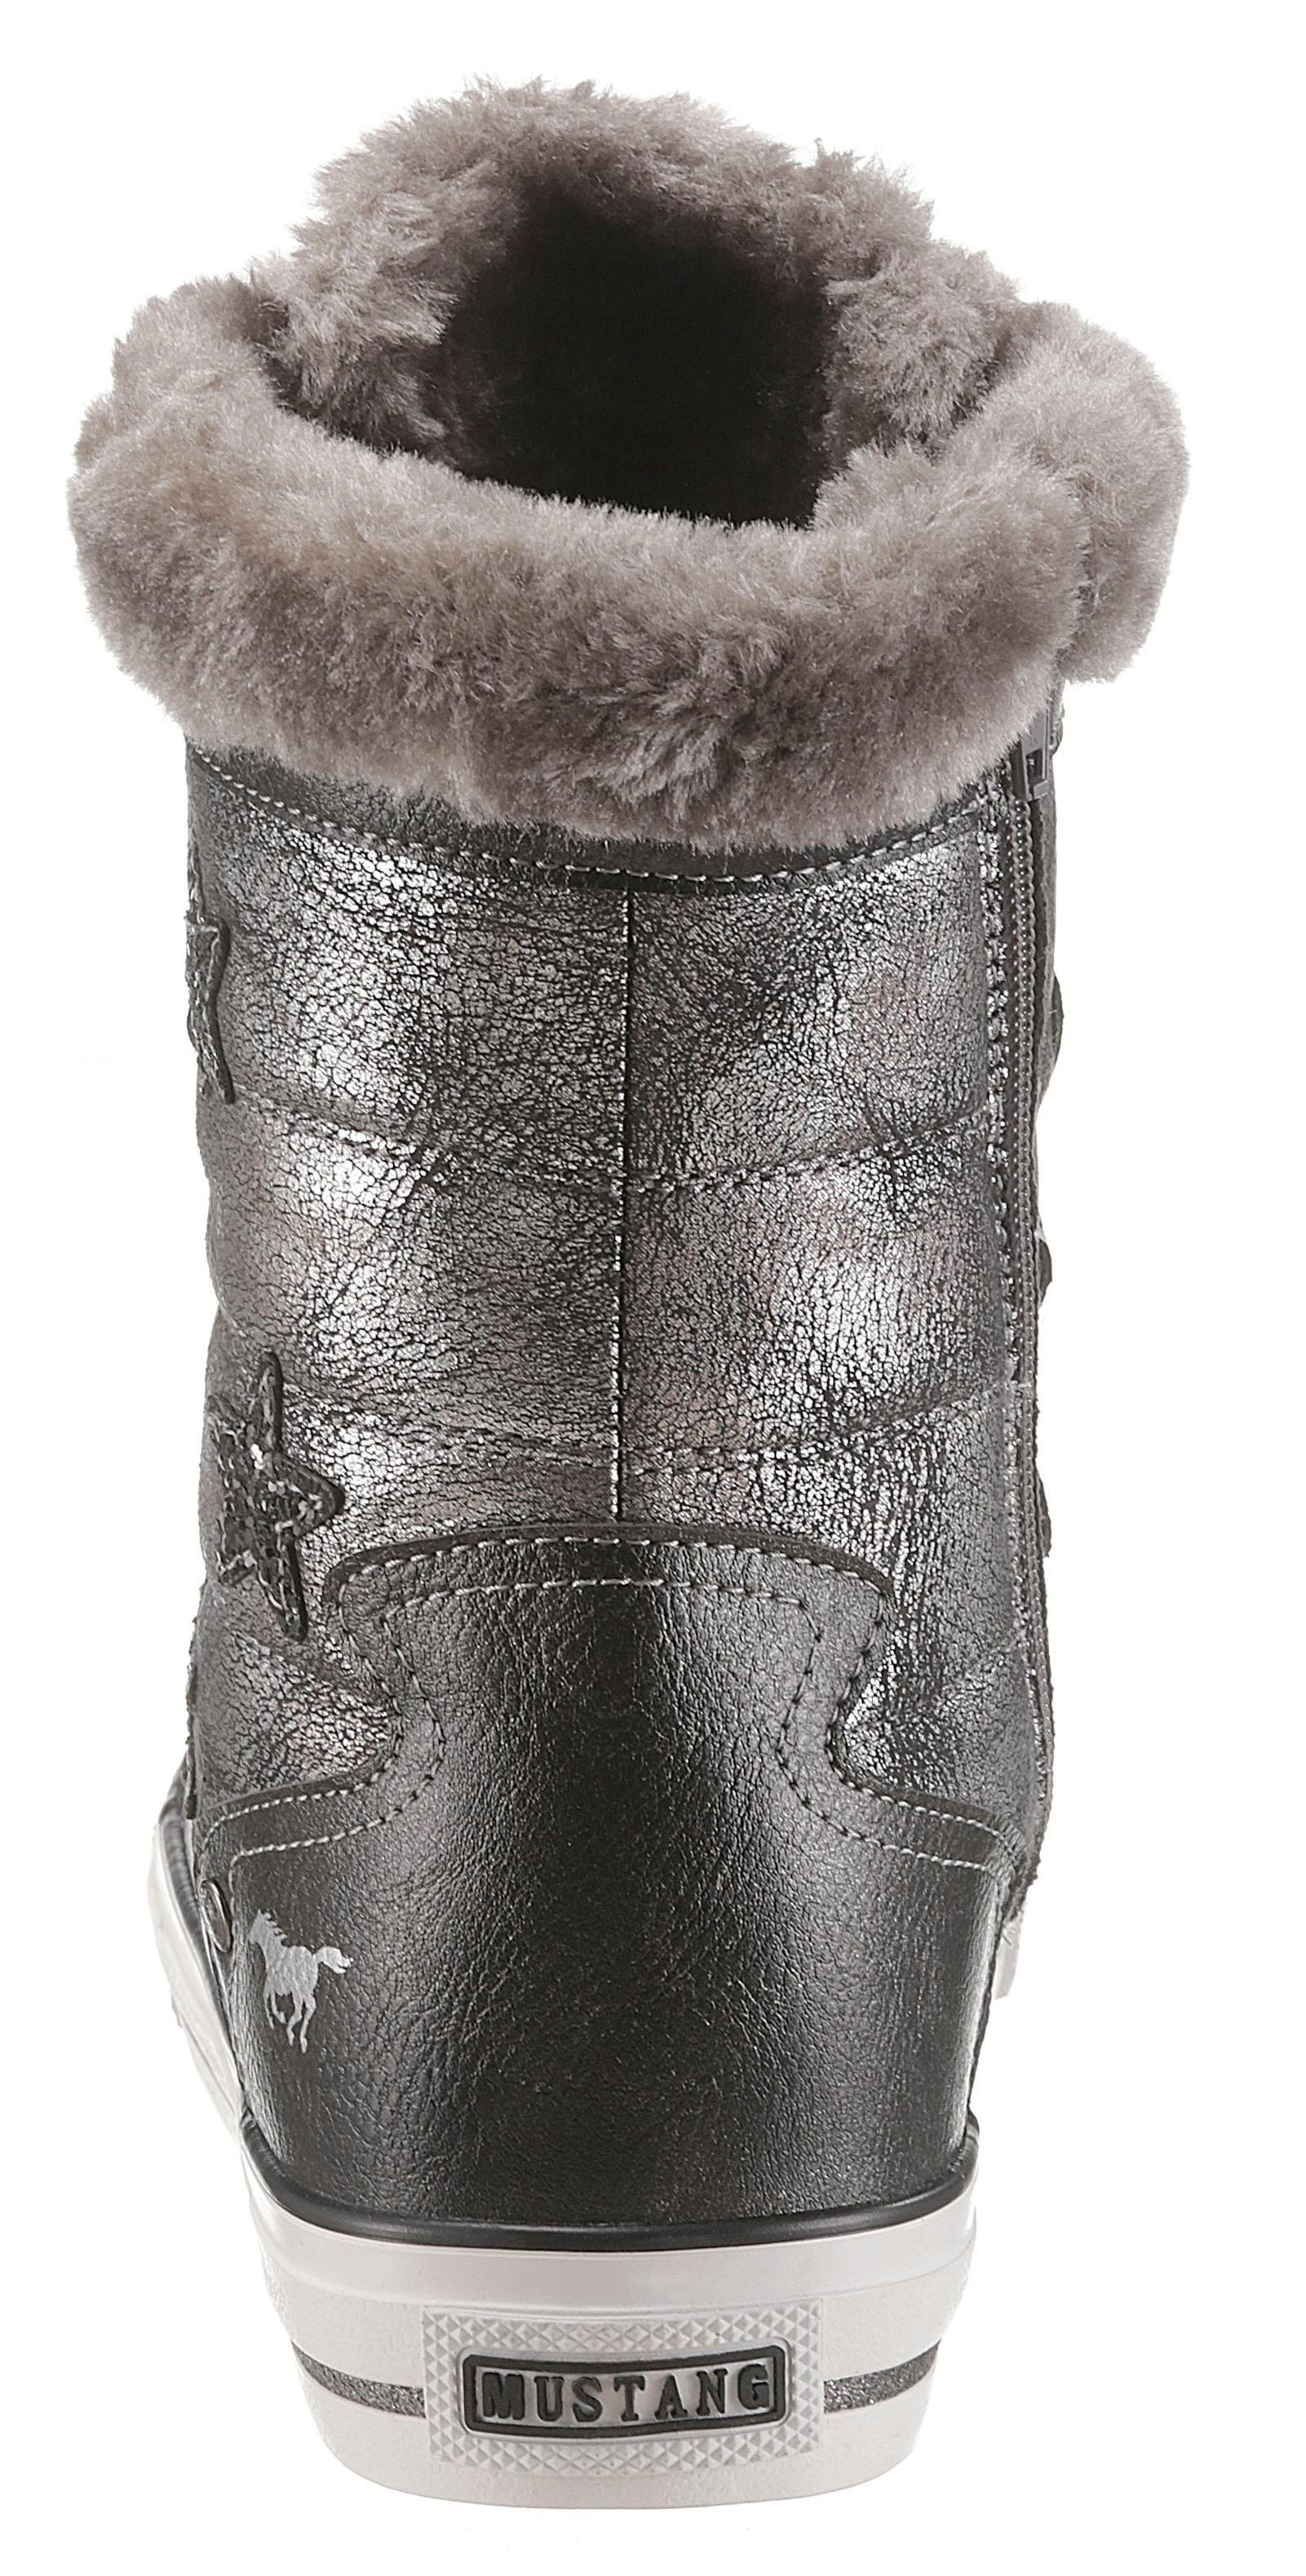 Online Gekocht Mustang Sneakers Snel Shoes 4c5SARLq3j